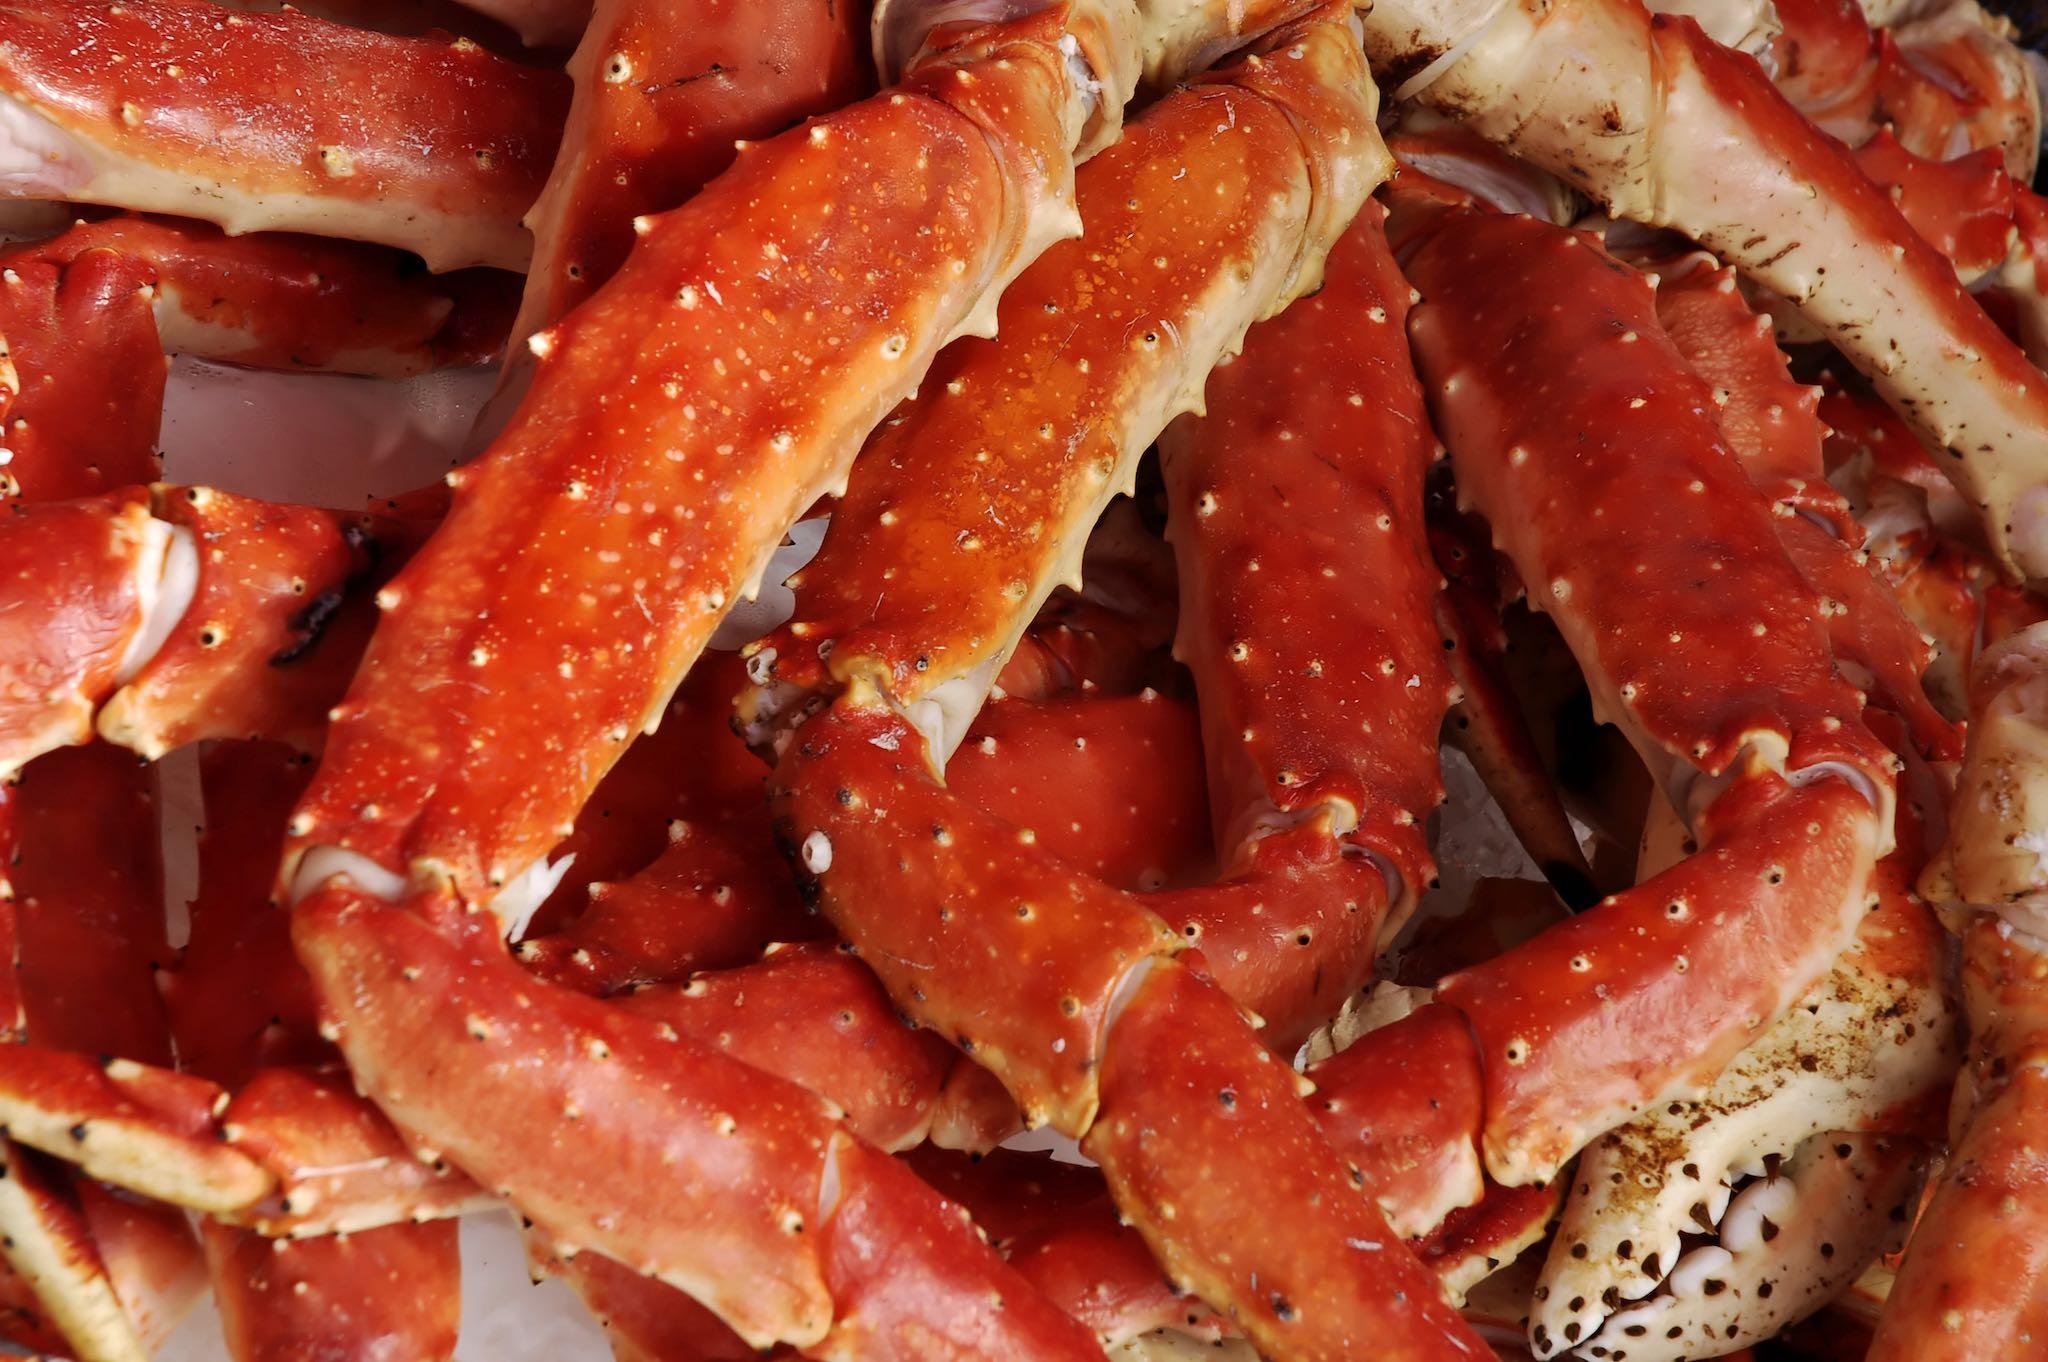 Imitation Crab Meat Imitation Crab Meat